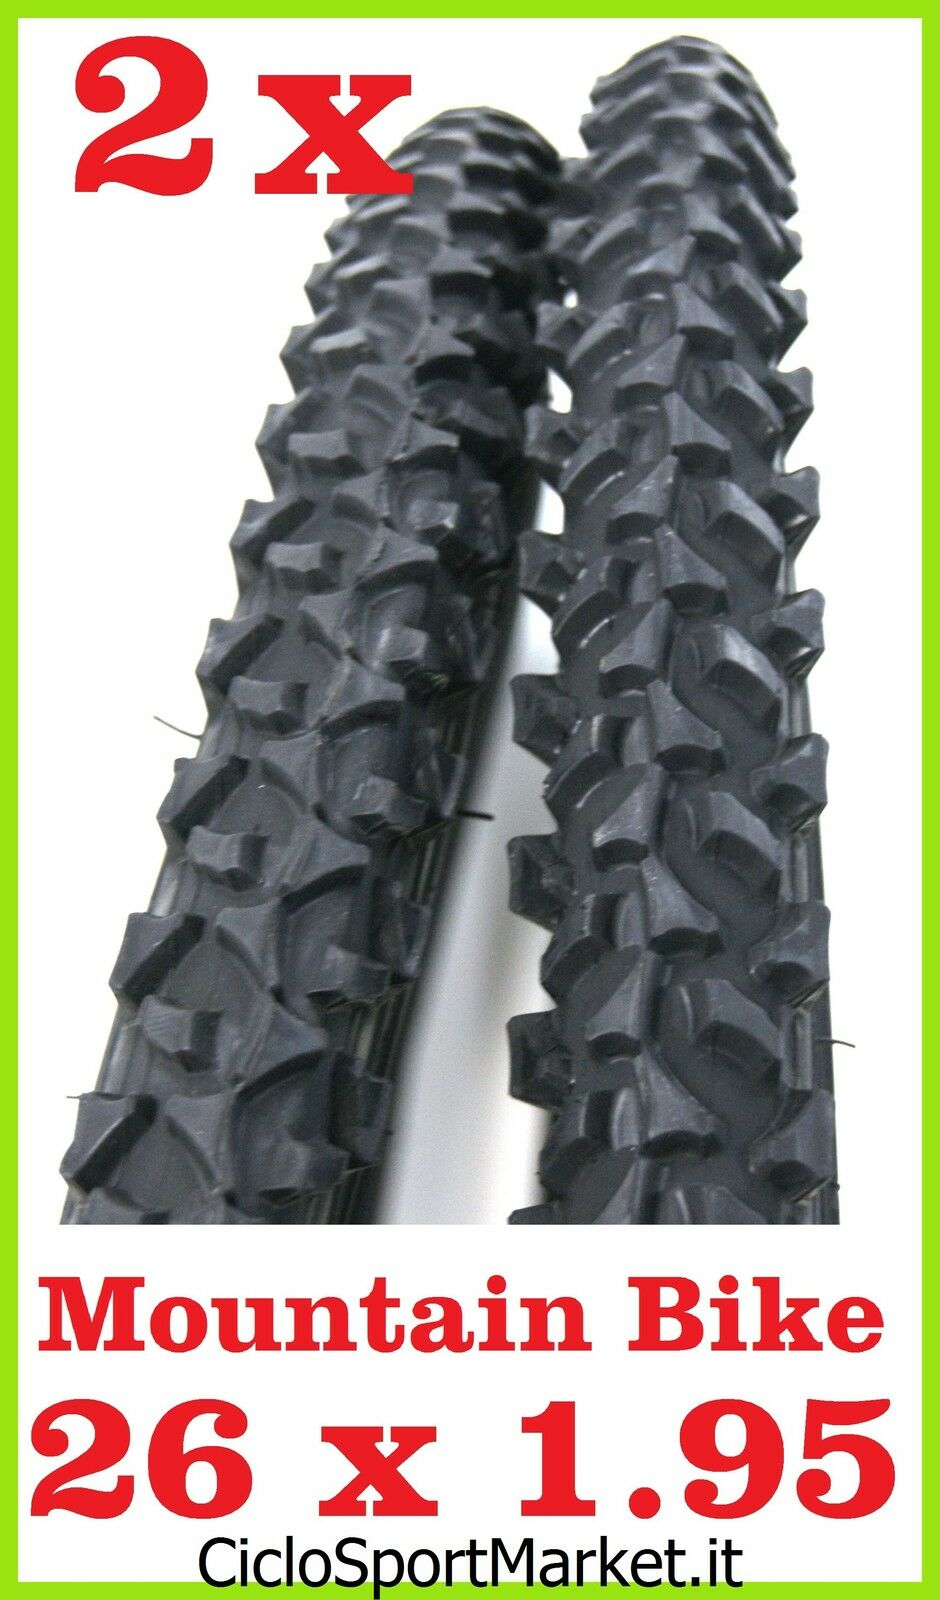 2 x Tyres for bicycle Bike MTB Mountain Bike Size 26 x 1.95 - black